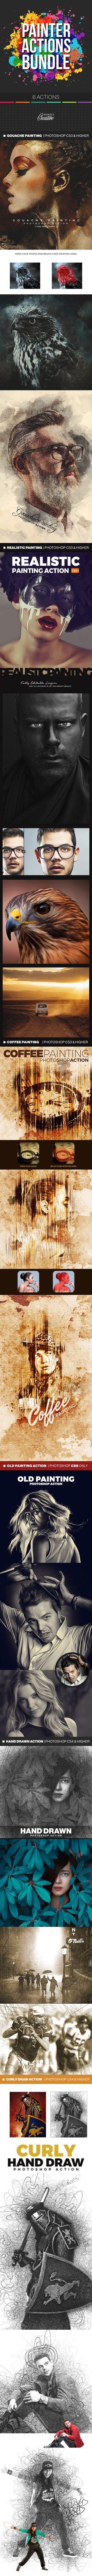 Photoshop Painter Actions Bundle - Photo Effects Actions. Download here: https://graphicriver.net/item/painter-bundle/16960273?s_rank=170&ref=yinkira